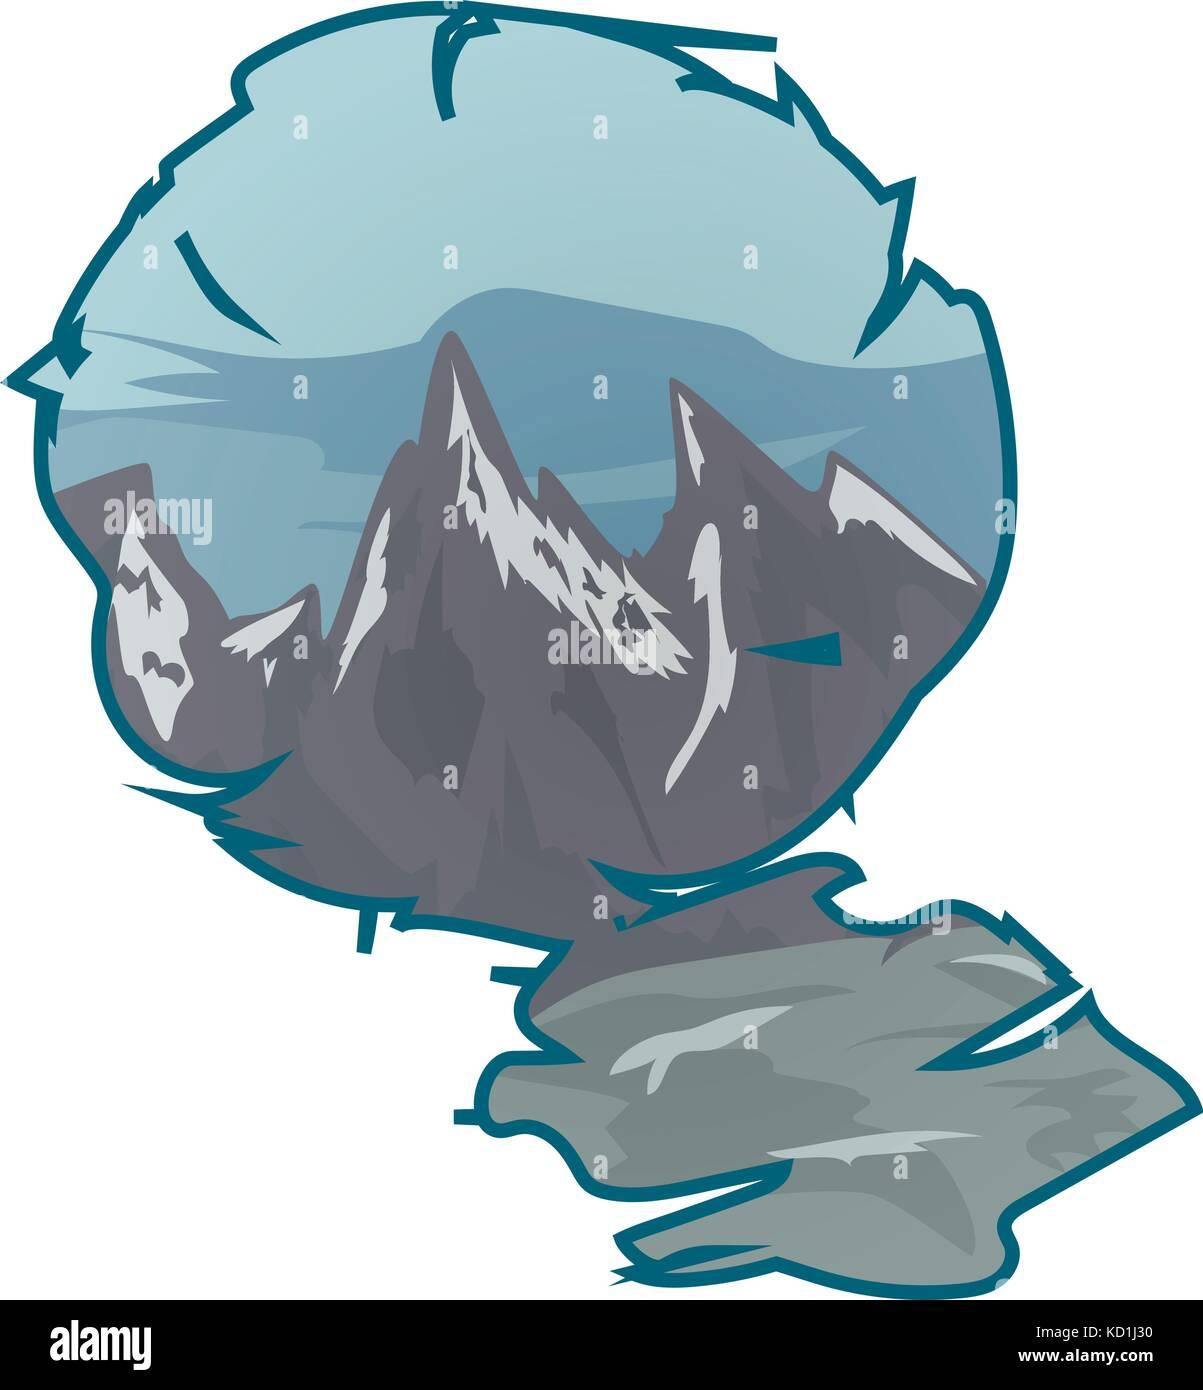 Mountain landscape in a frame - Stock Vector